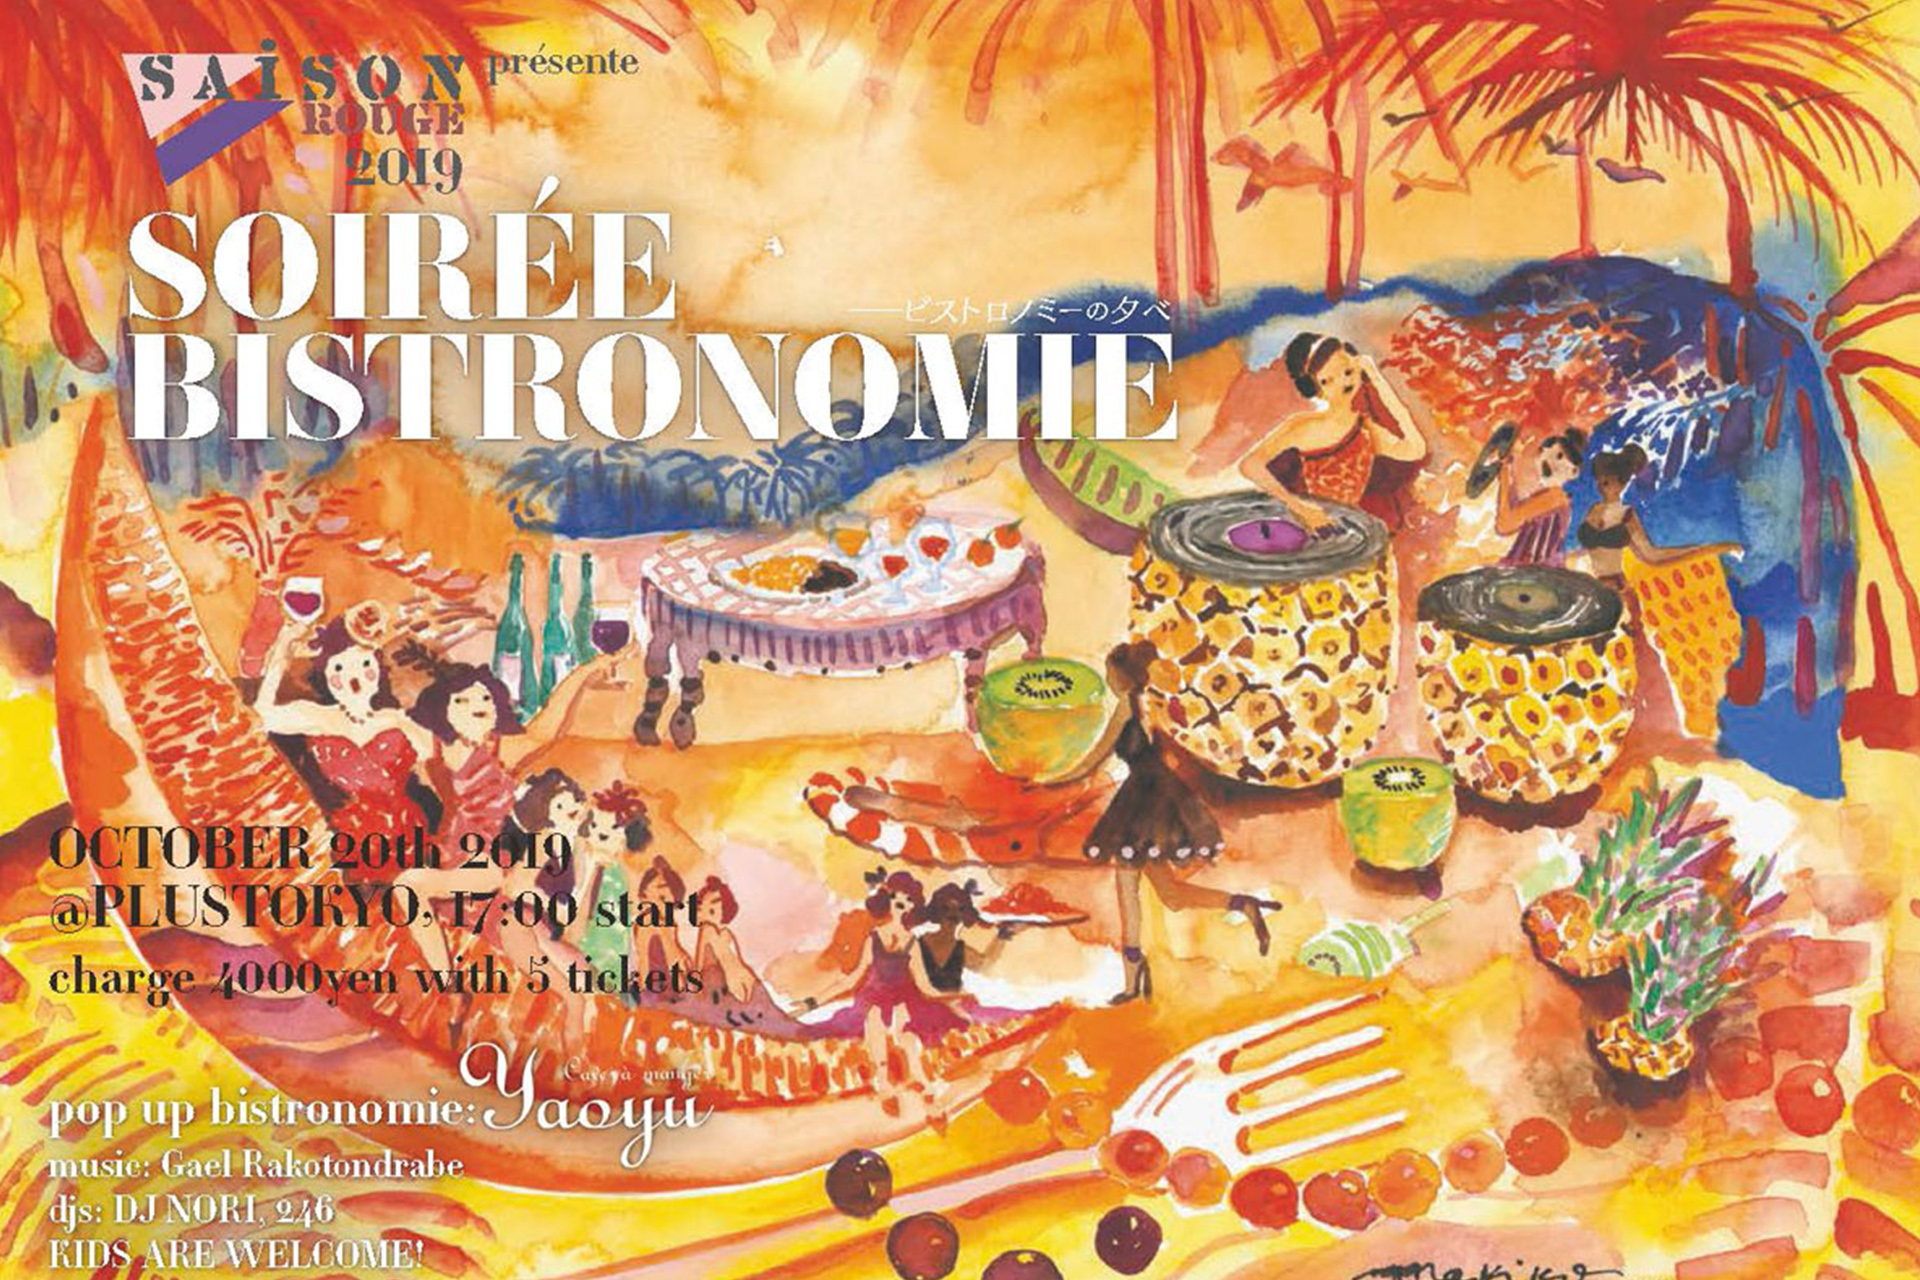 apéro. X saison rouge - アペロ ワインバー / オーガニックワインxフランス家庭料理 - 東京都港区南青山3-4-6 / apéro WINEBAR - vins et petits plats français - 2016